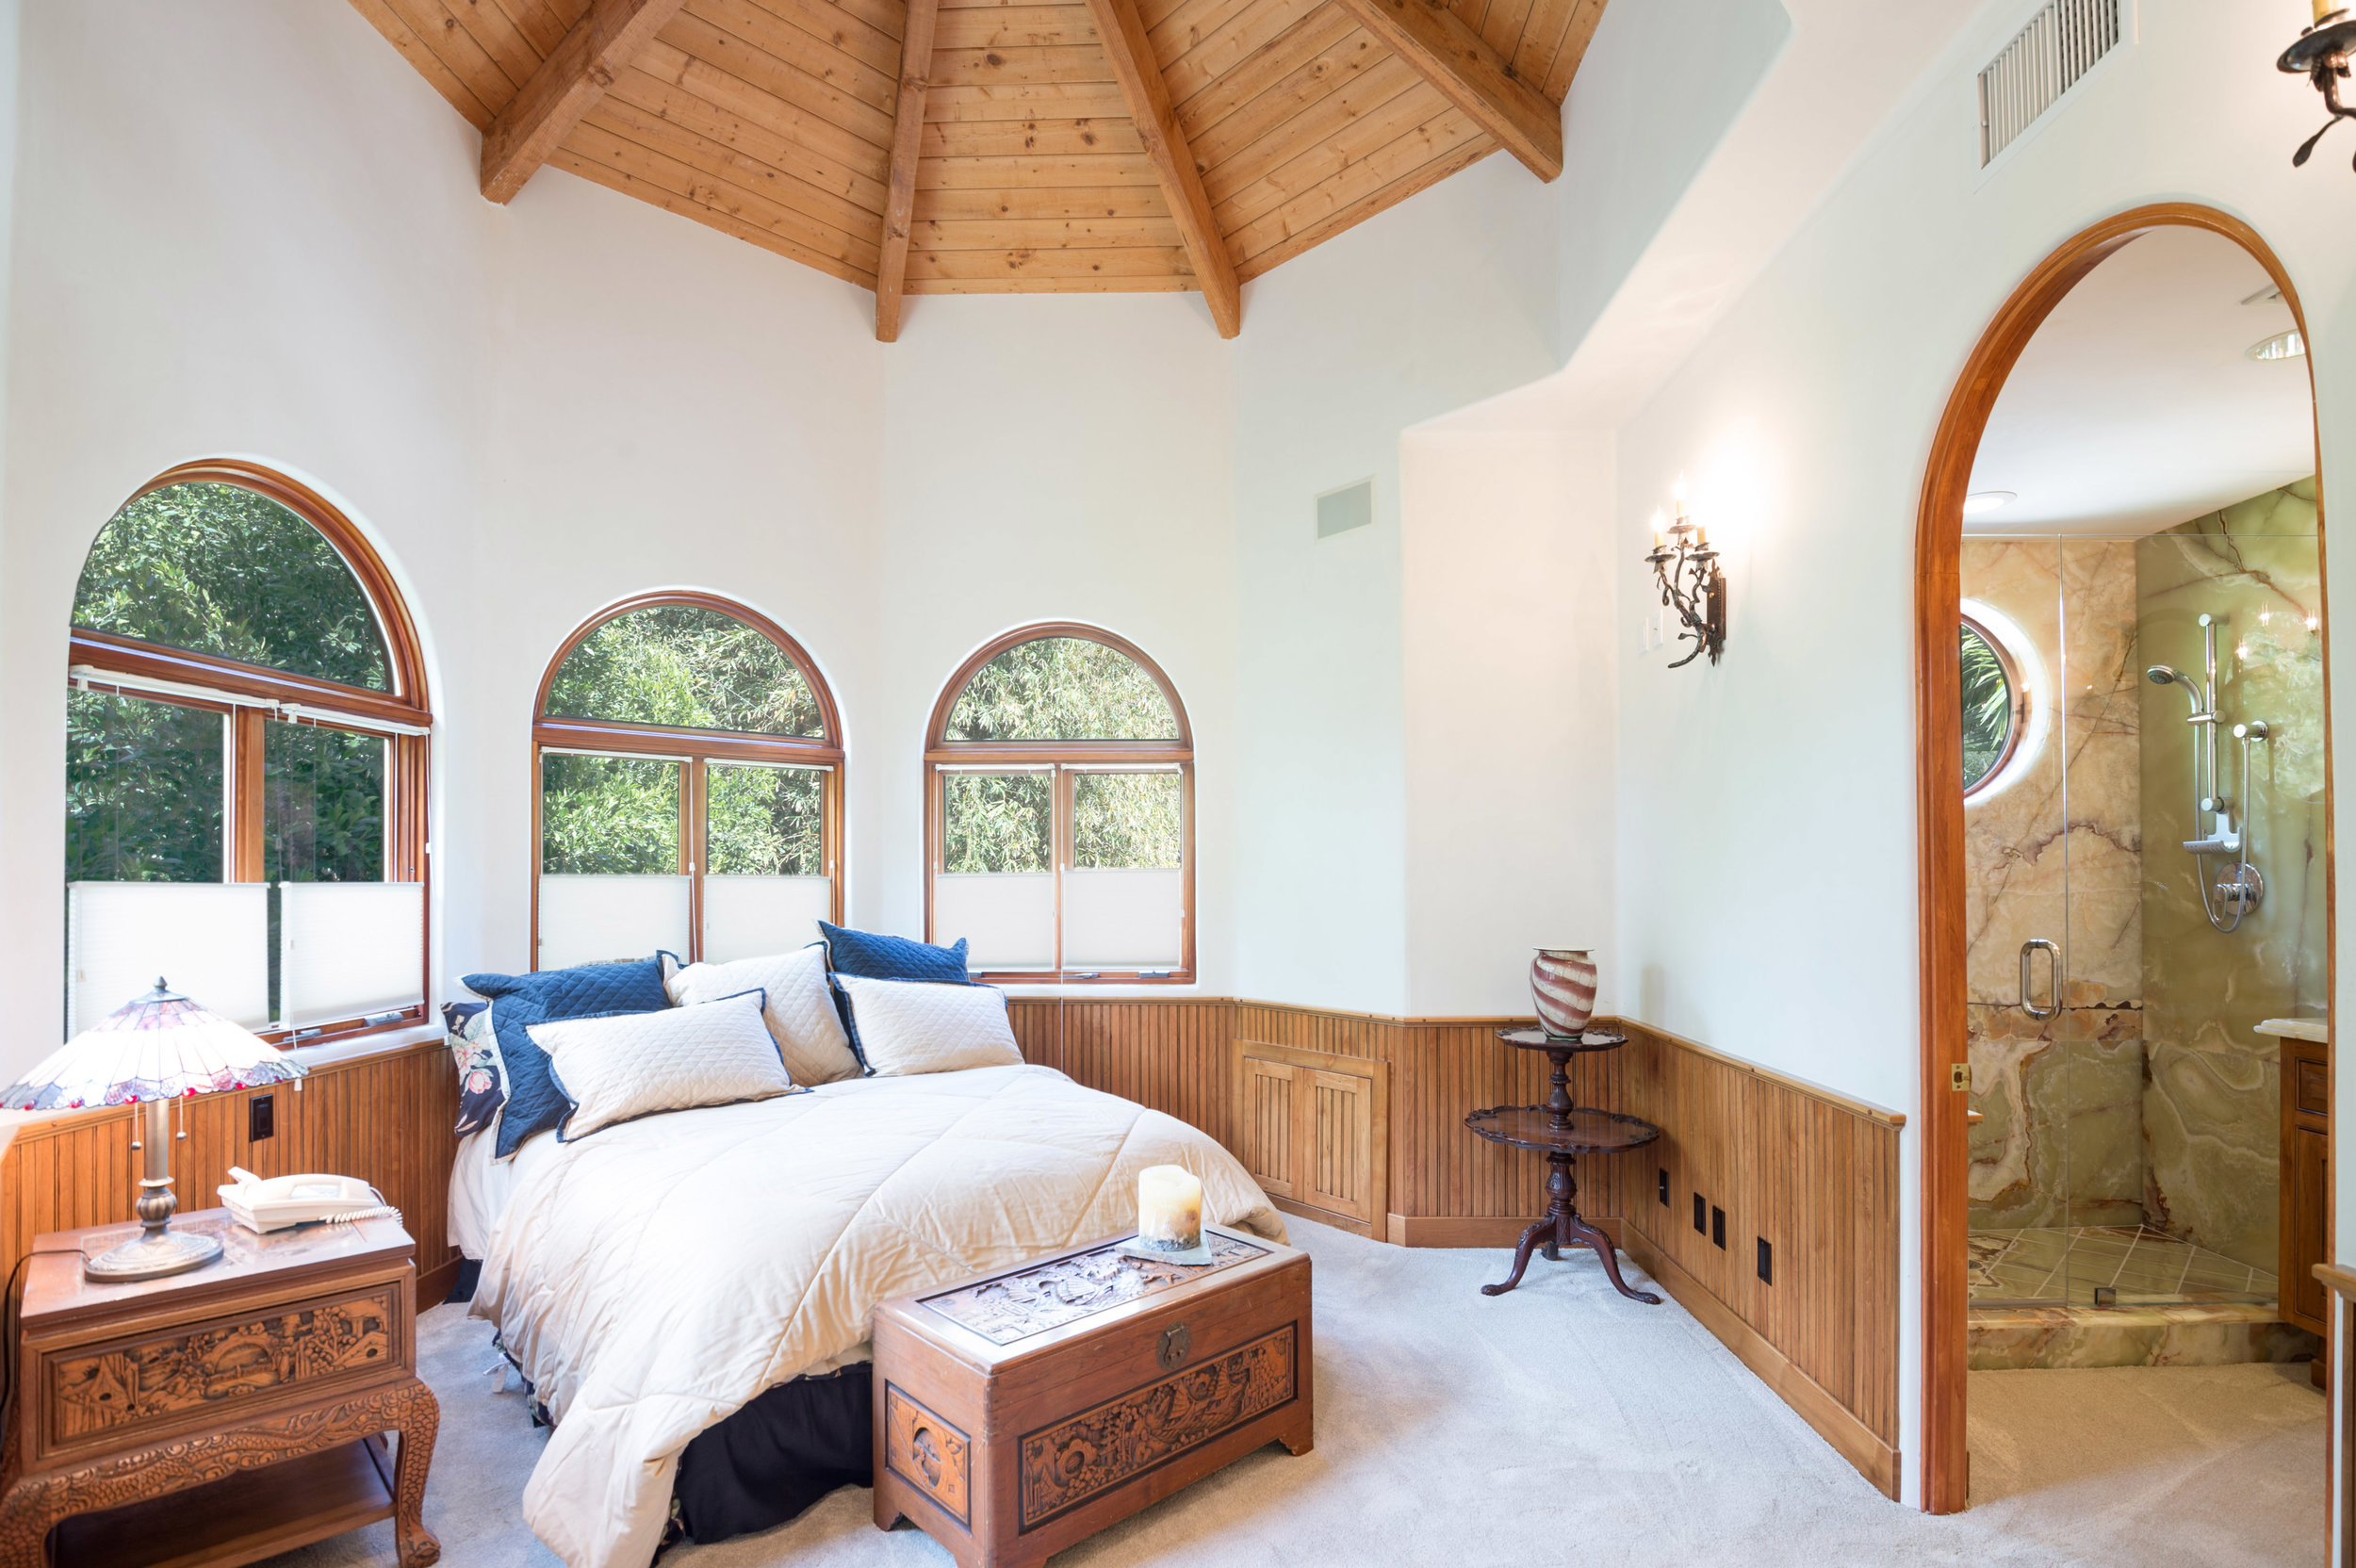 019 guest bedroom 2 6405 bonsall Malibu For Sale The Malibu Life Team Luxury Real Estate.jpg